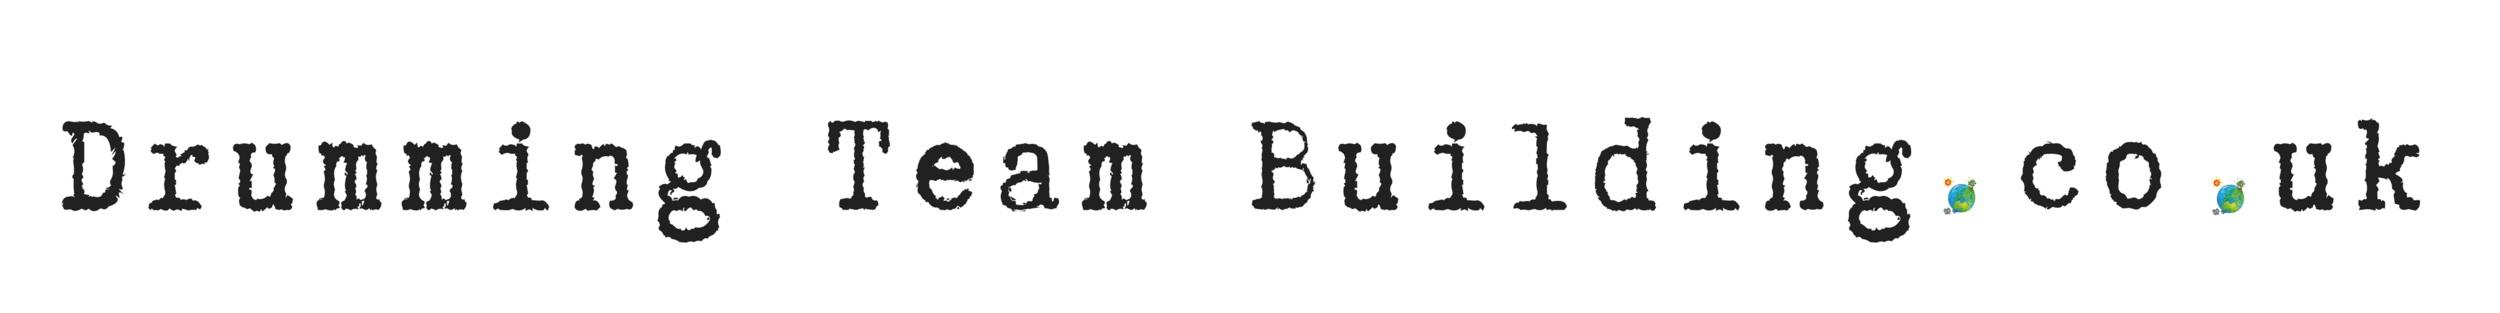 DRUMMING TEAM BUILING LOGO 2018.png